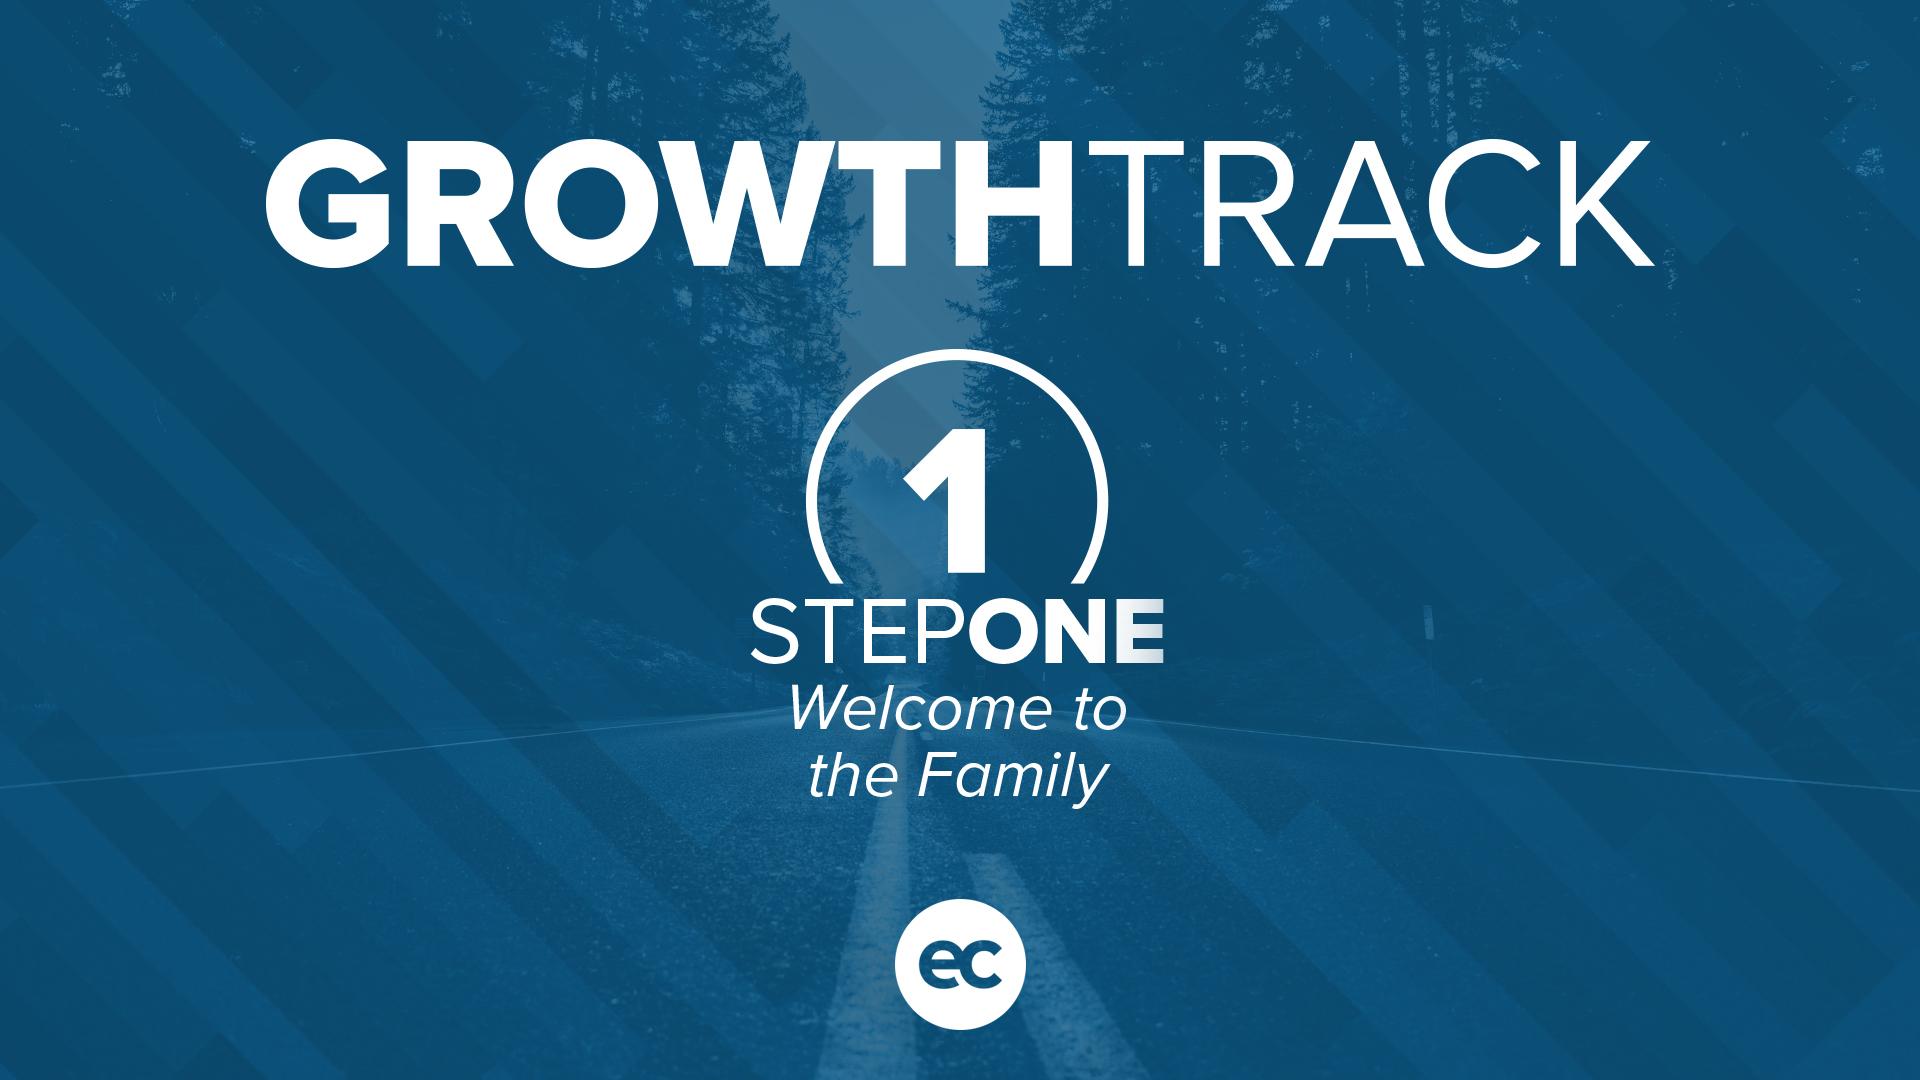 Growth Track_StepOne.jpg